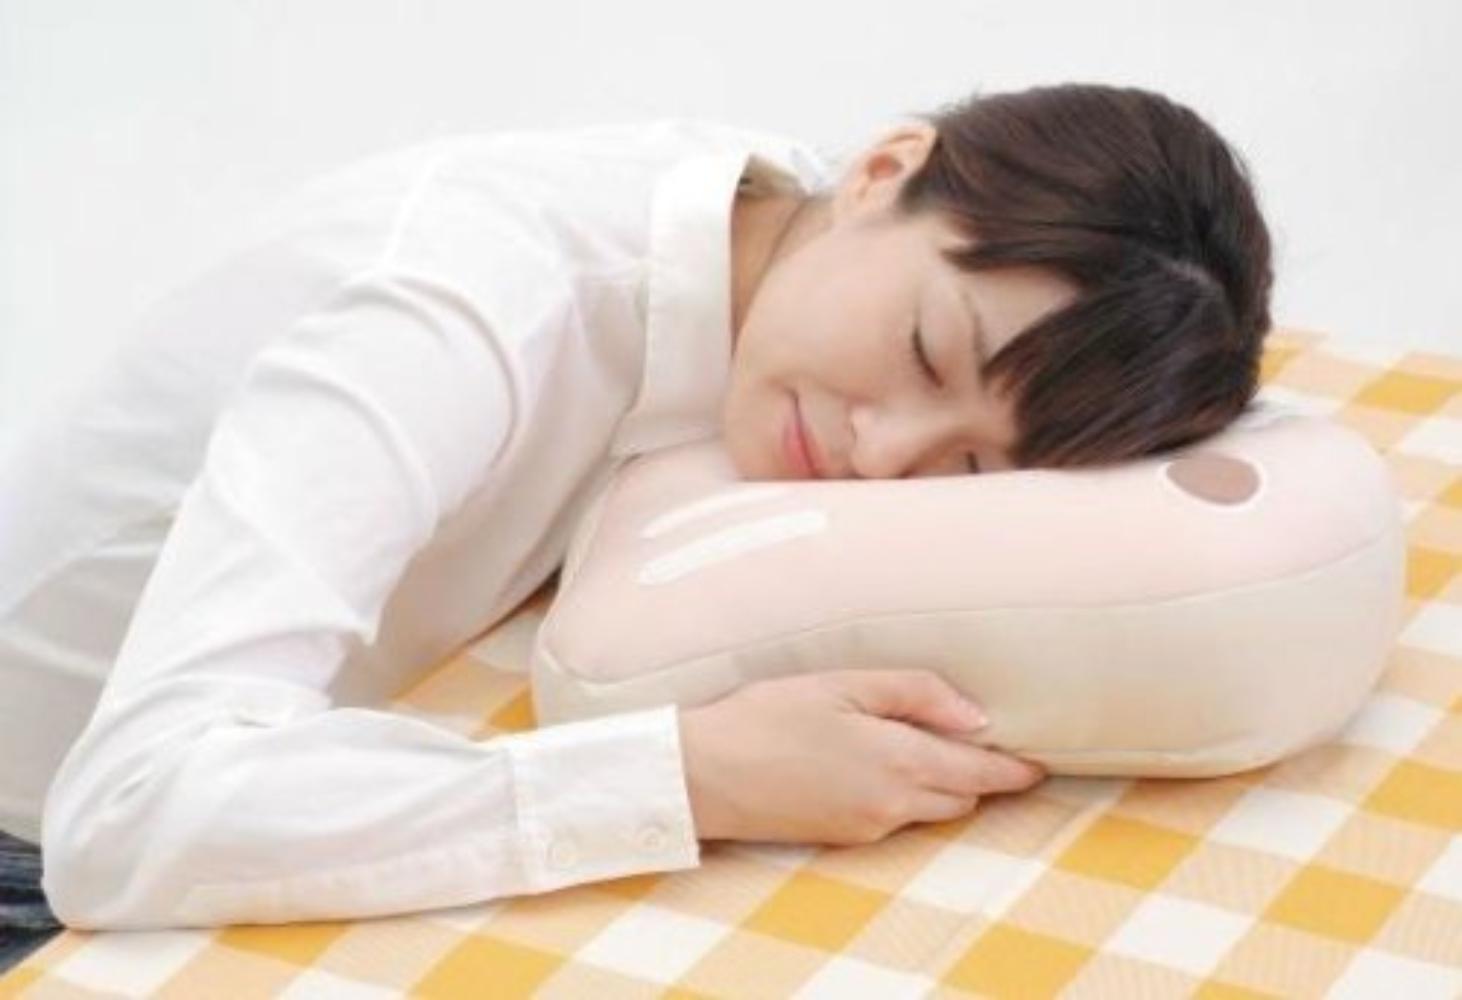 Center Hole Sleeping Relax Pillow-Desk Nap Cushion W// Arm Slot School Office Use